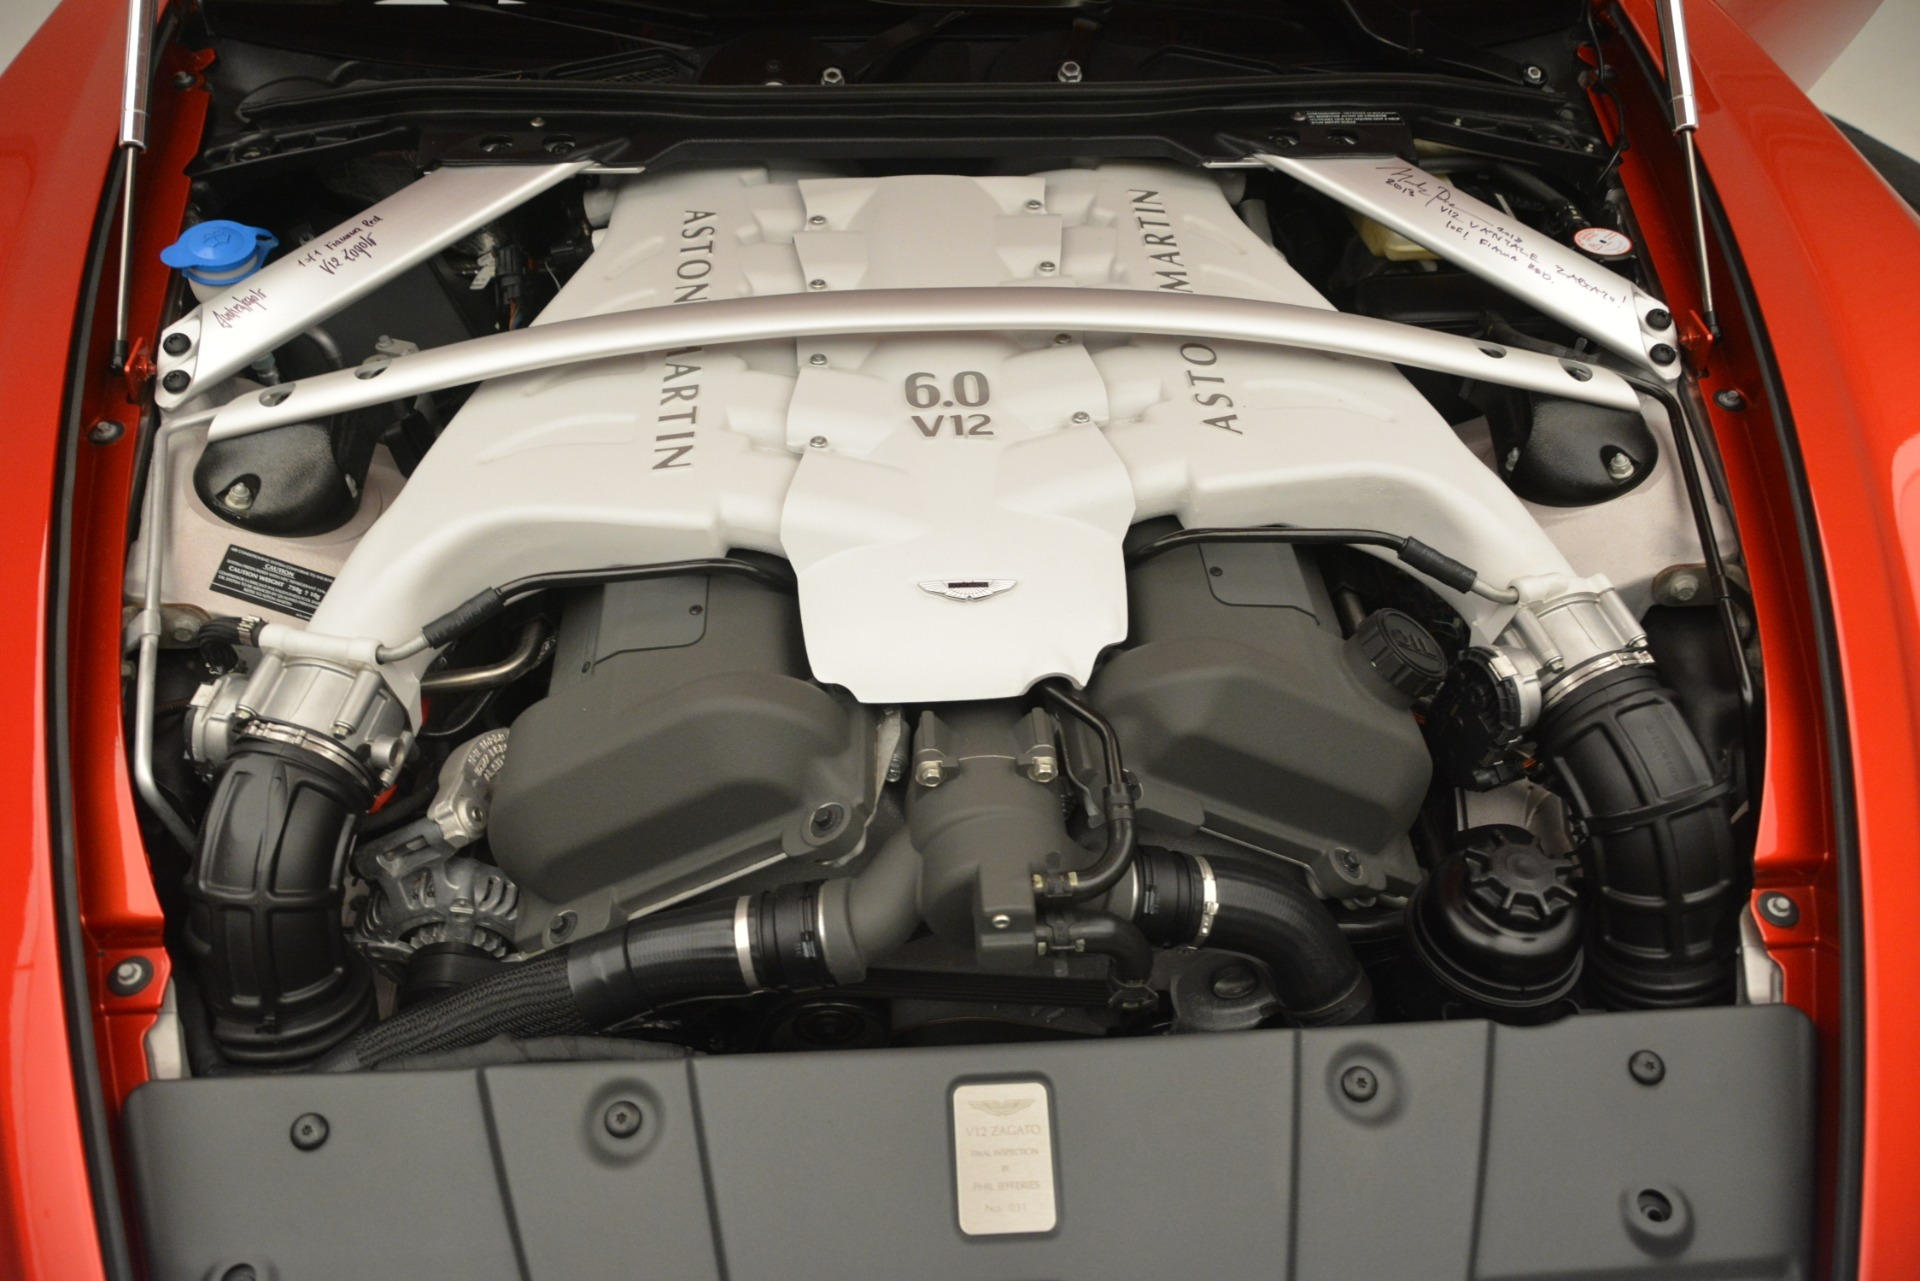 Used 2013 Aston Martin V12 Zagato Coupe For Sale In Westport, CT 3181_p26